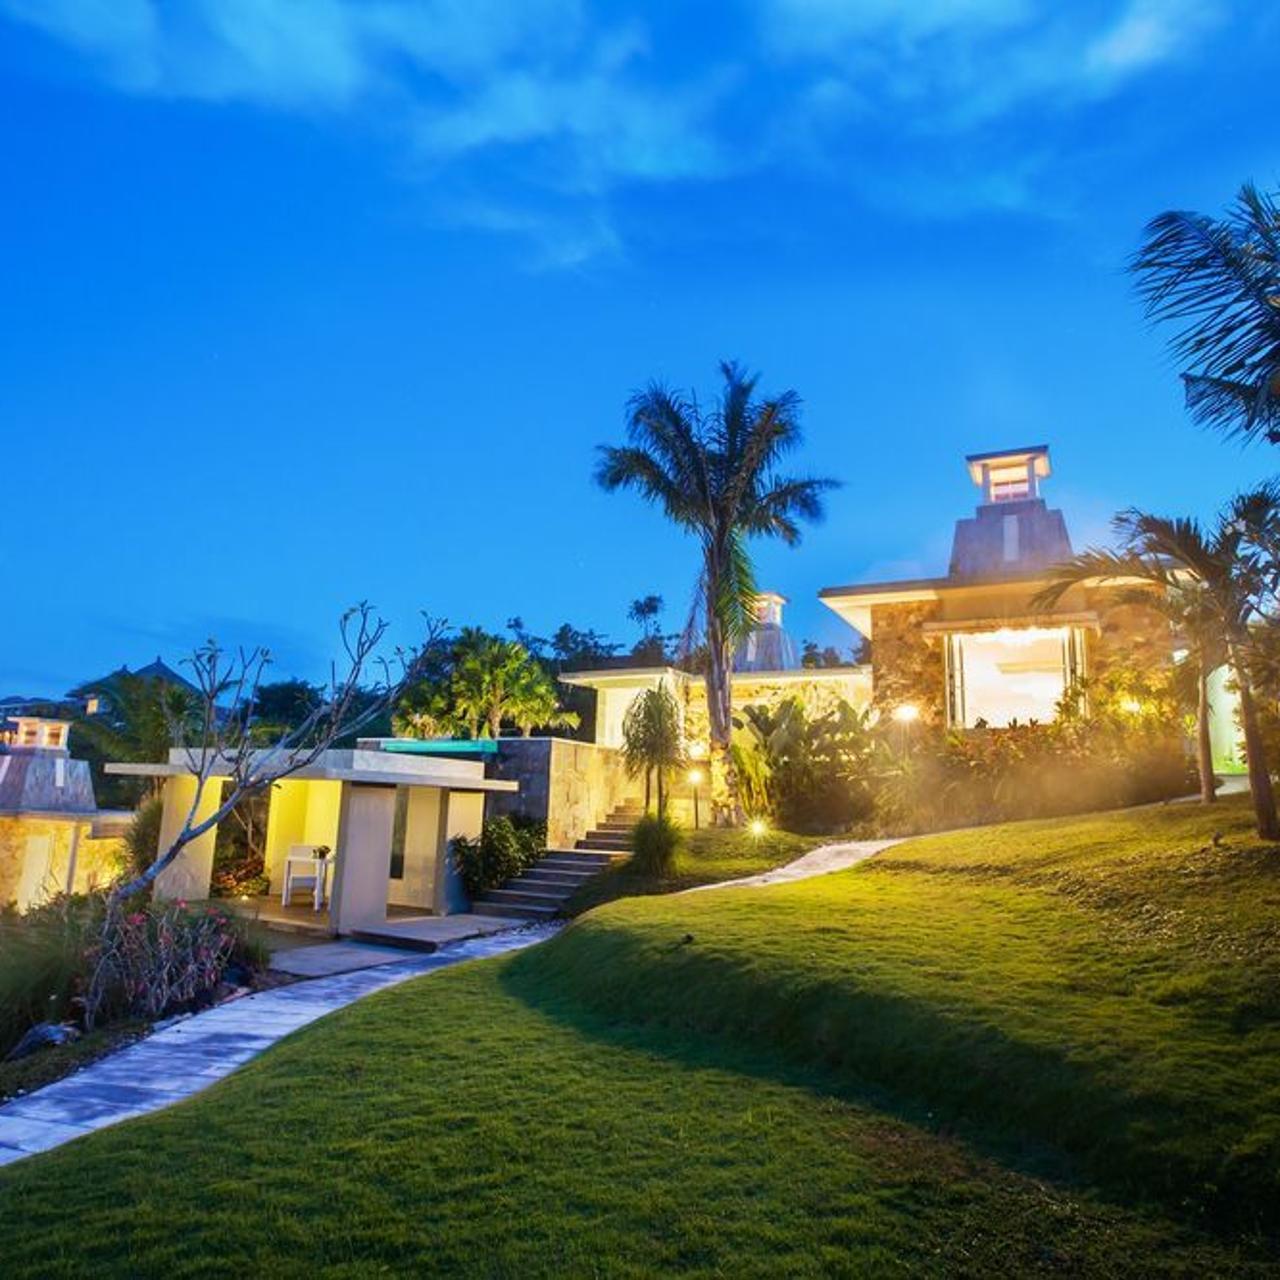 Hotel Noah Villa And Chapel 3 Hrs Star Hotel In Nusa Dua Bali